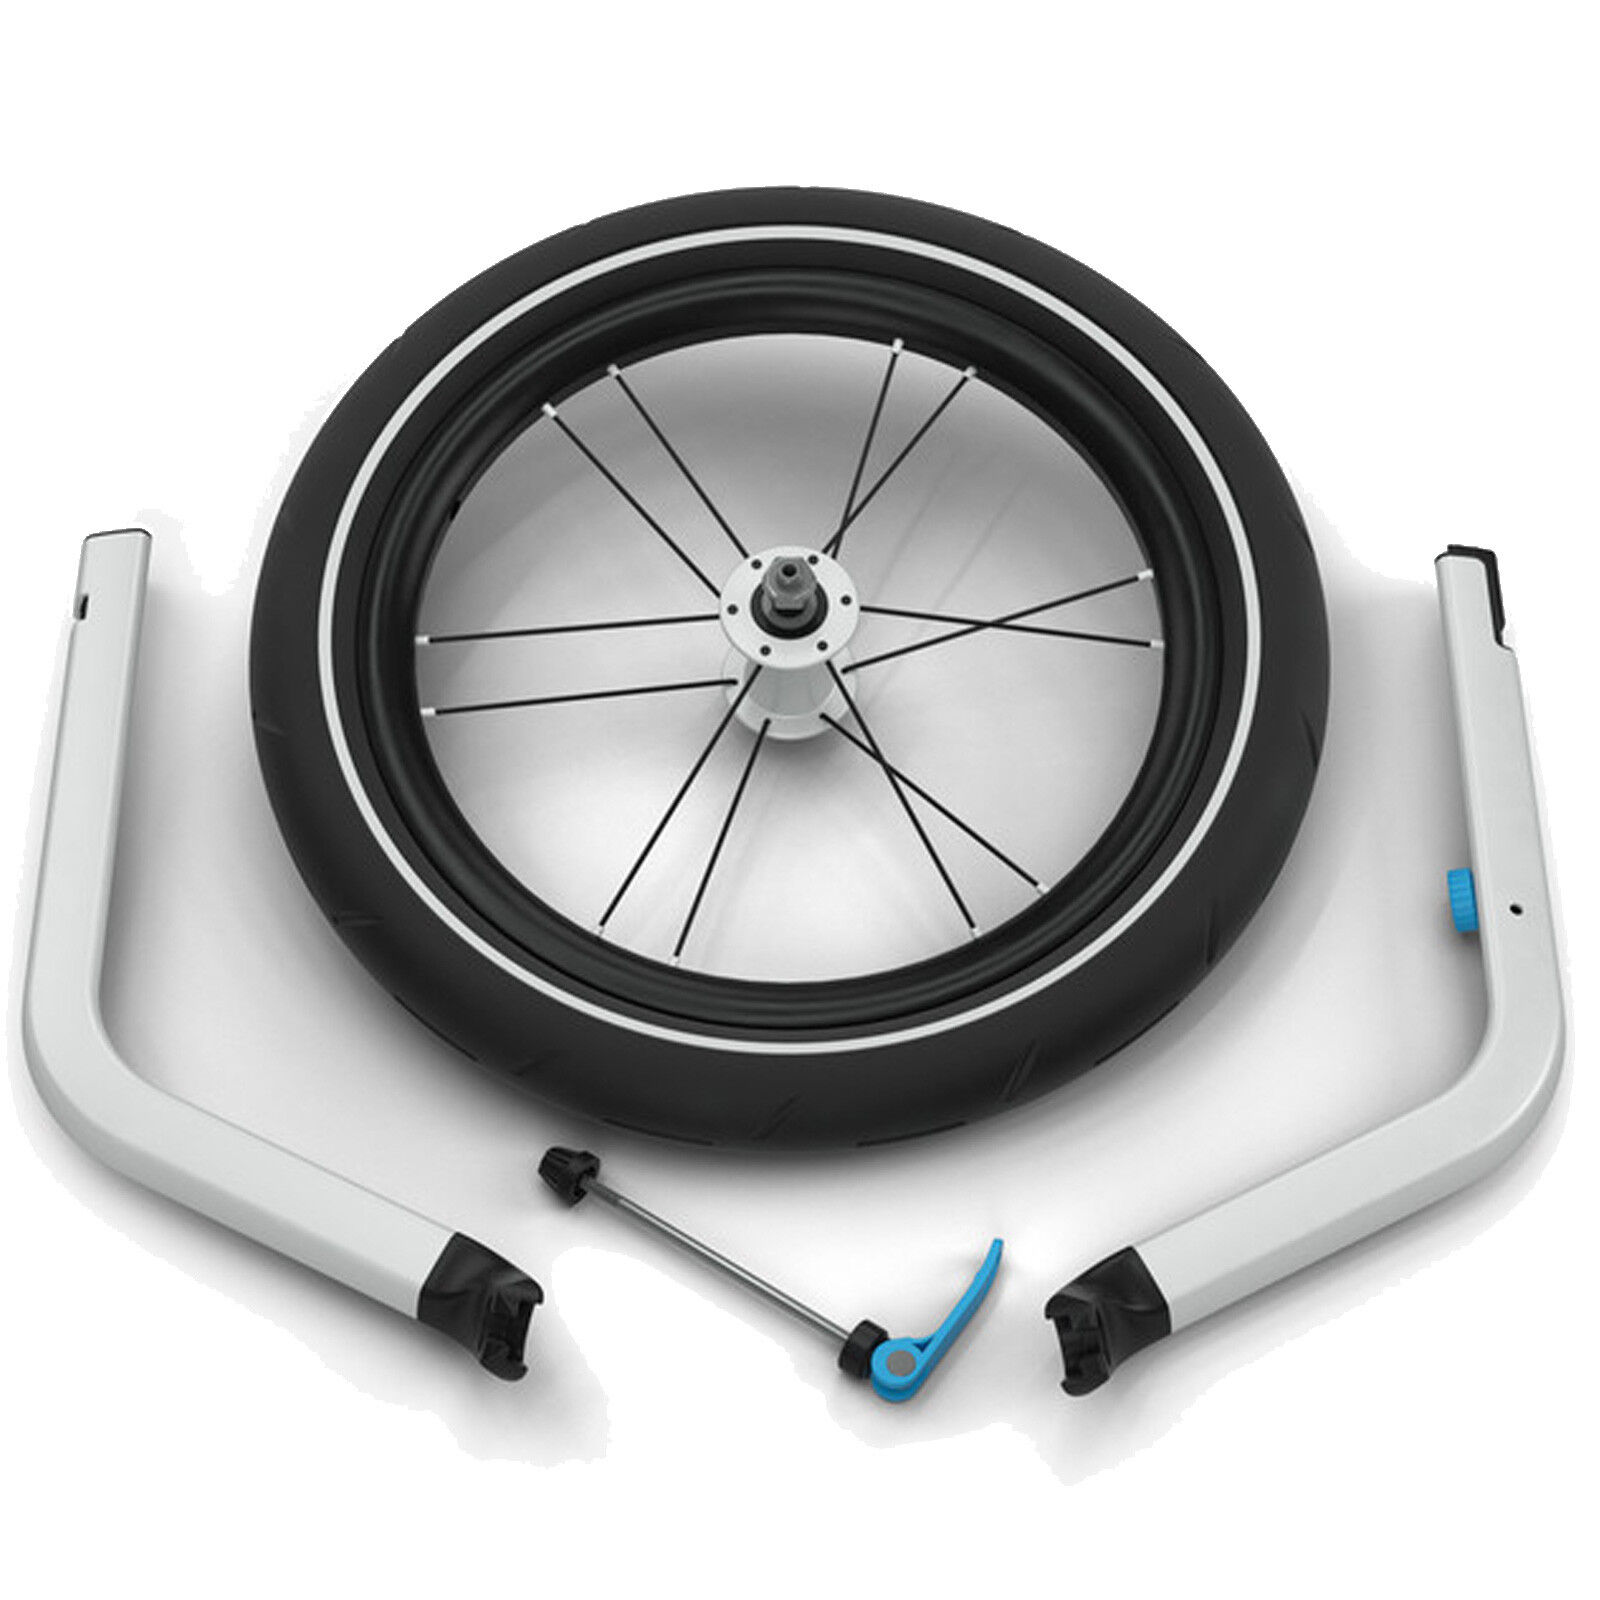 Thule Chariot Jogging Kit Fahrradanhänger-zubehör Bici Joggingrad Bici Fahrradanhänger-zubehör senza Pedali 8d9457